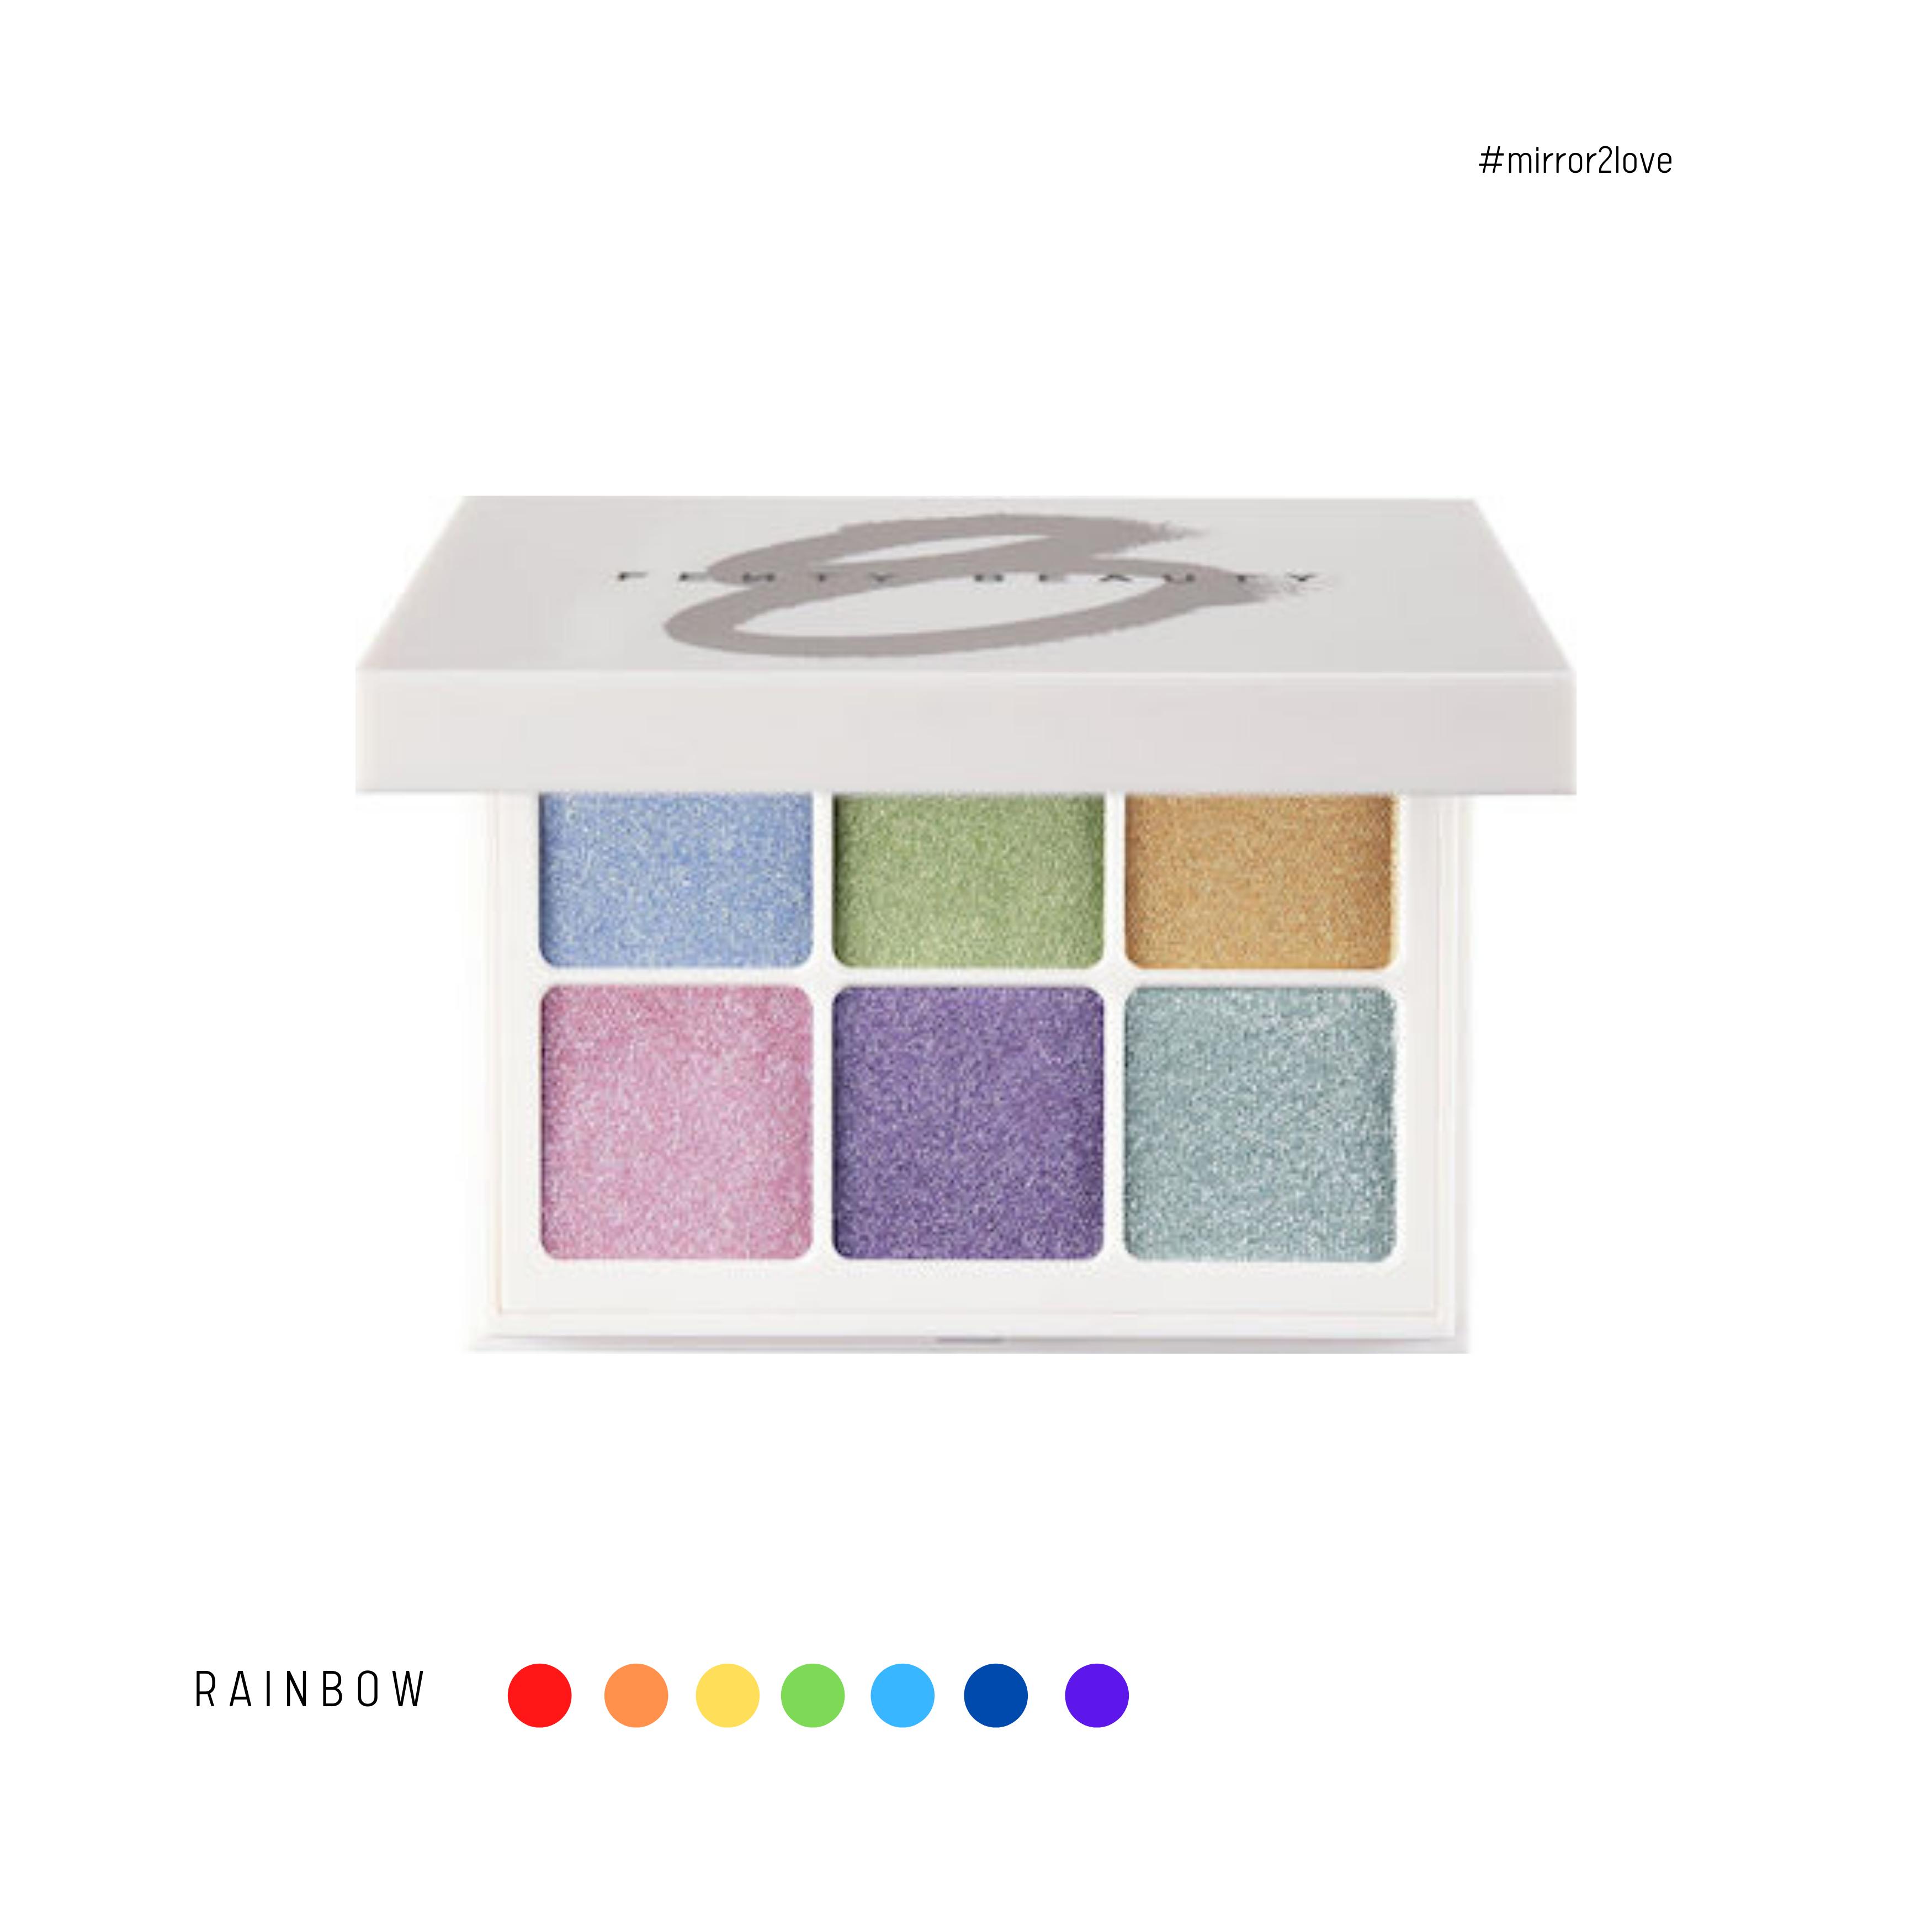 Fenty Beauty Snap Shadow Mix & Match Eyeshadow Palette